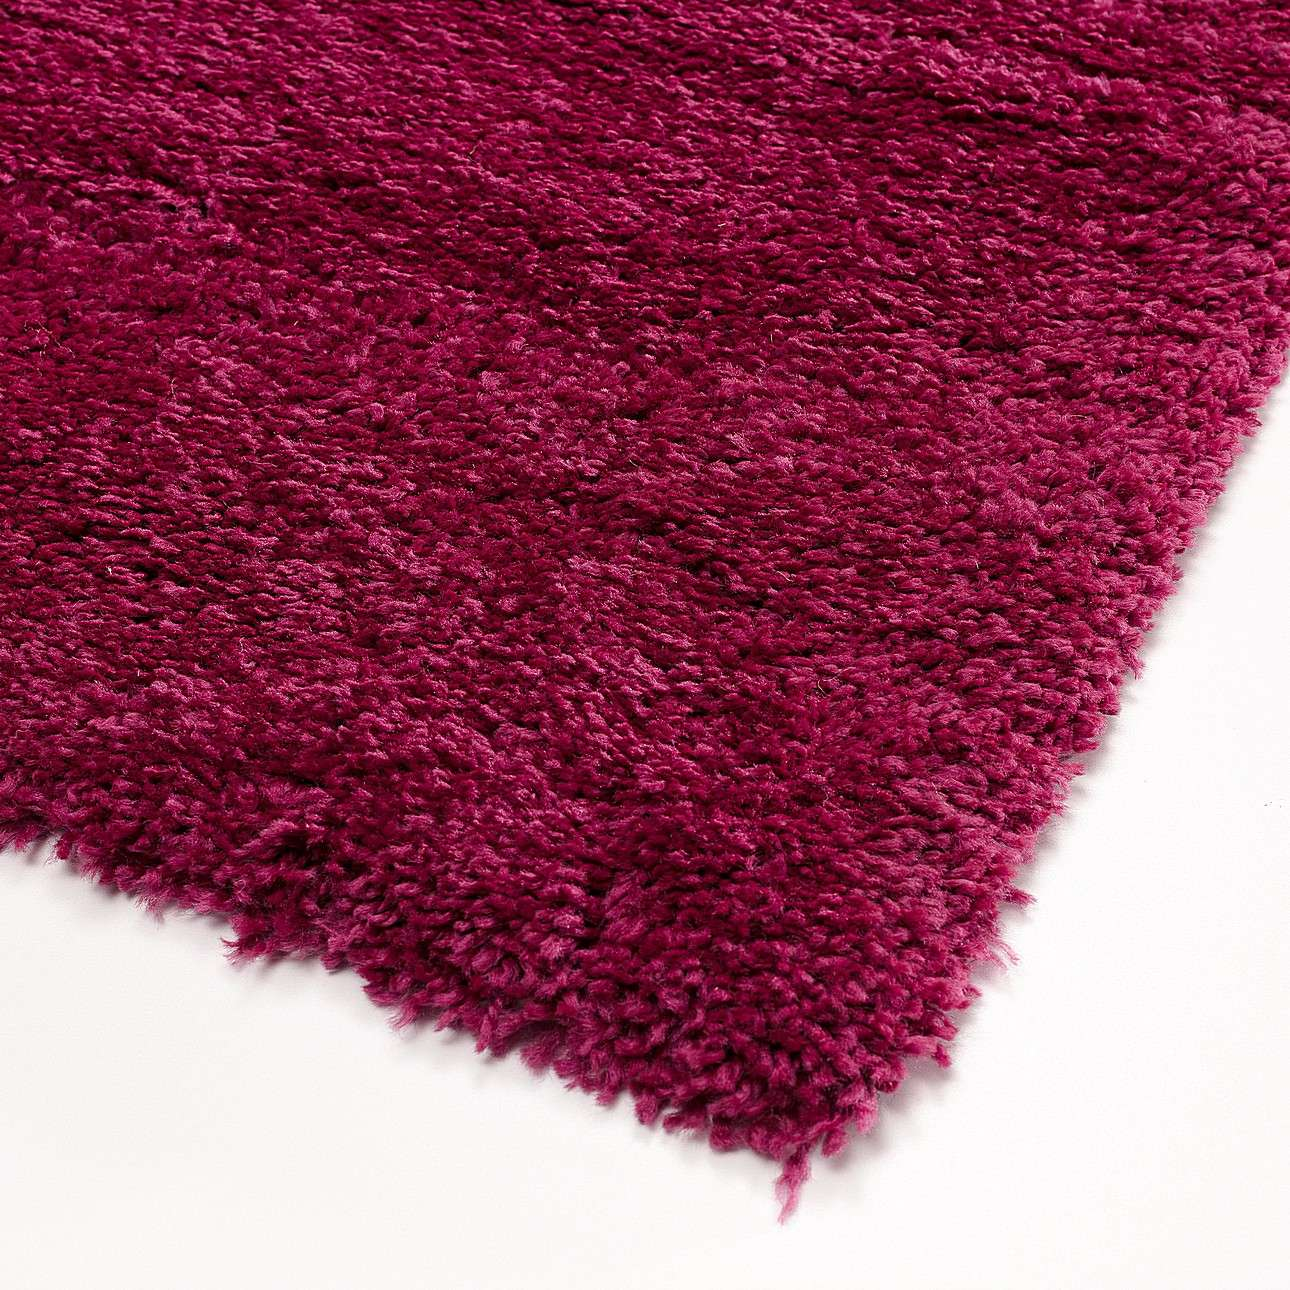 Teppich Royal deep magenta/cream 120x170cm